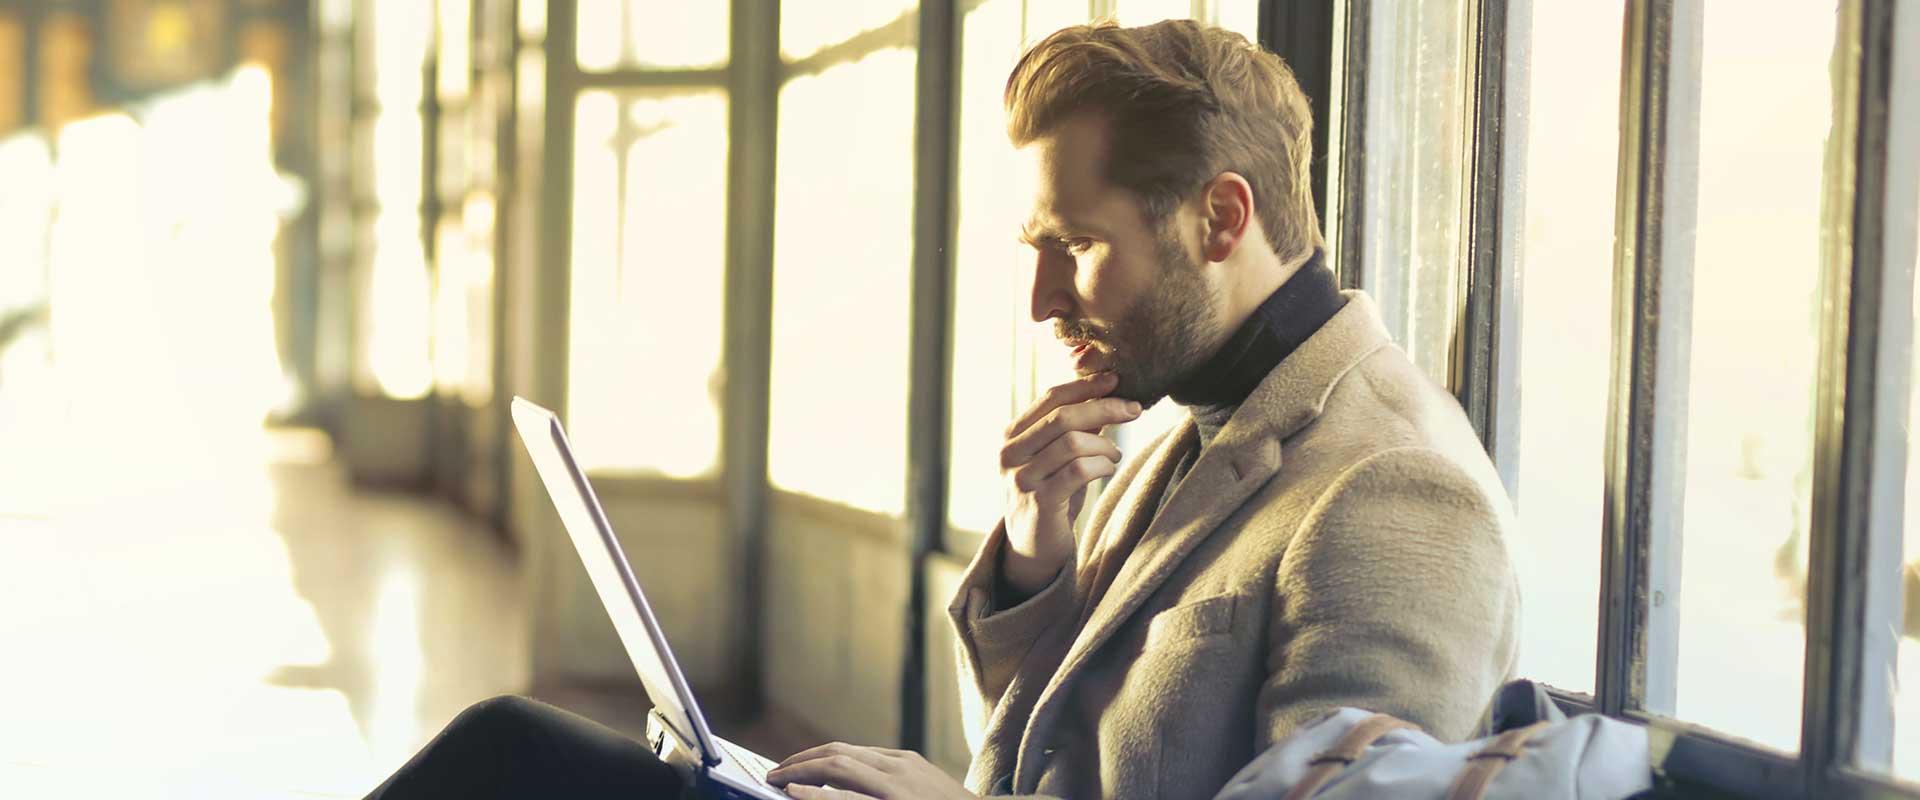 The Top 4 Growth Strategies | CPIA Webinar Series